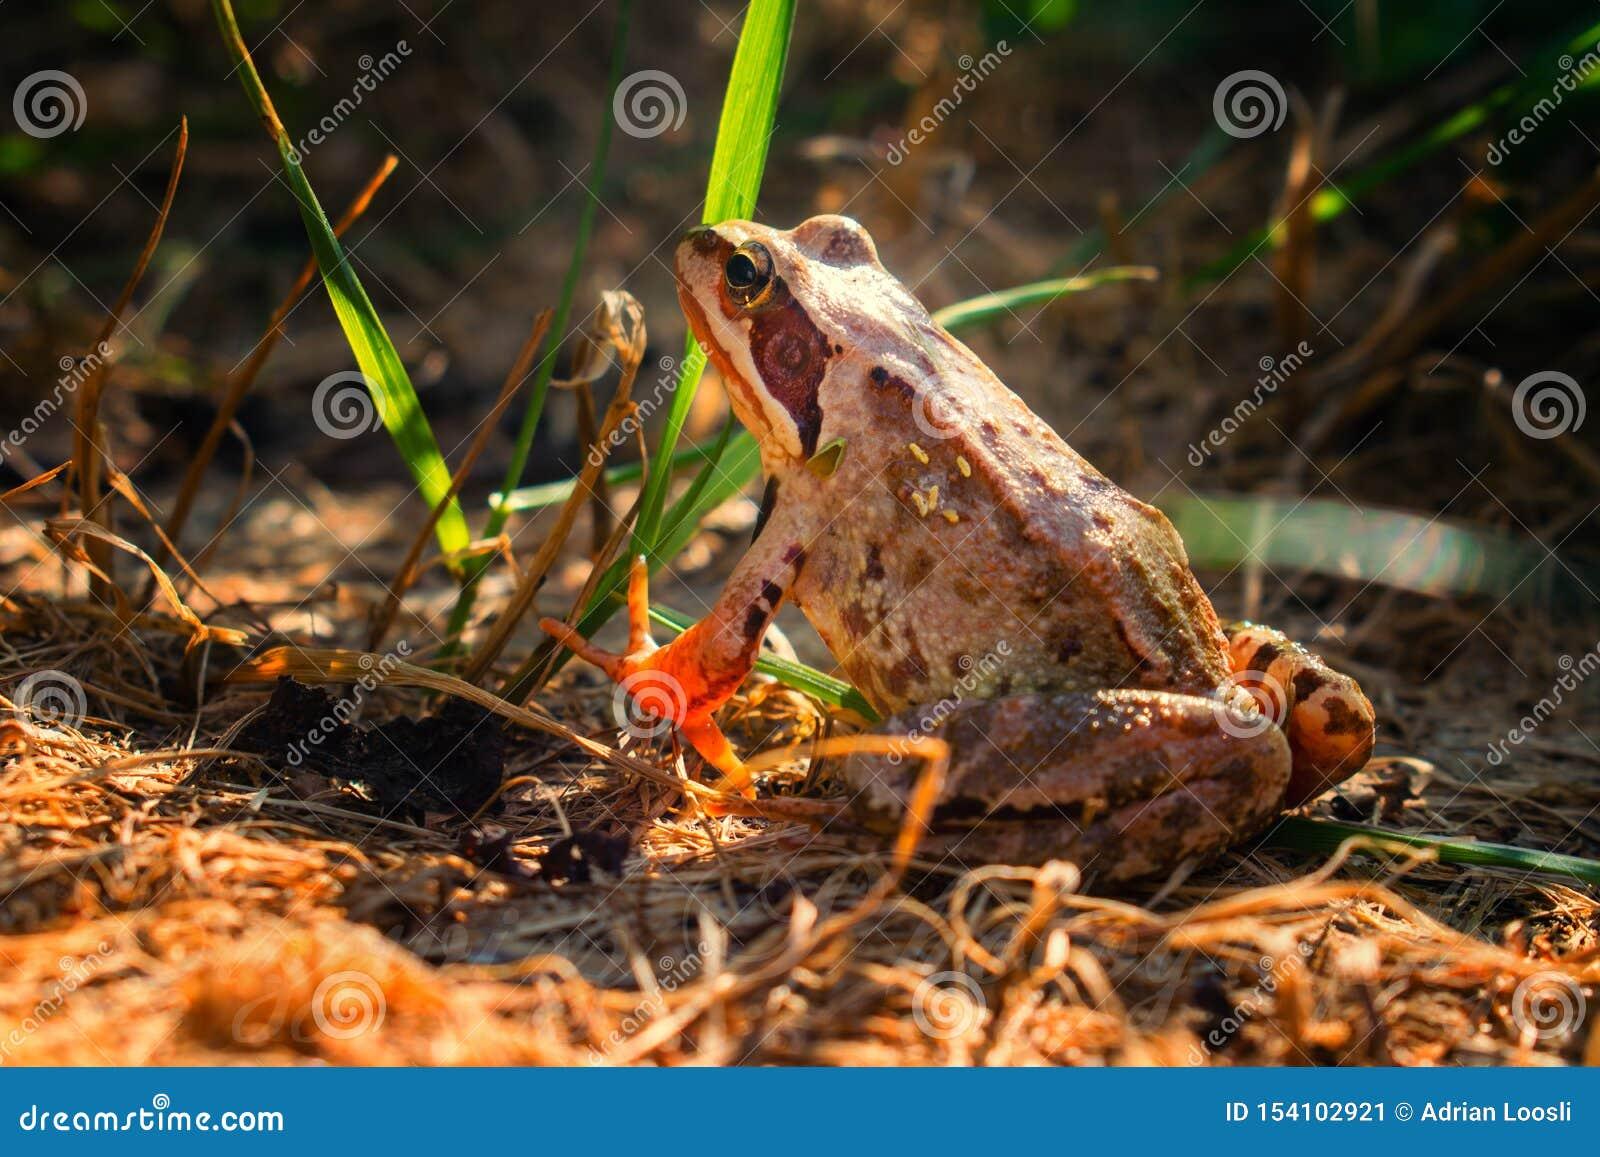 Bruine behendige kikker op bruine grond, achtermening